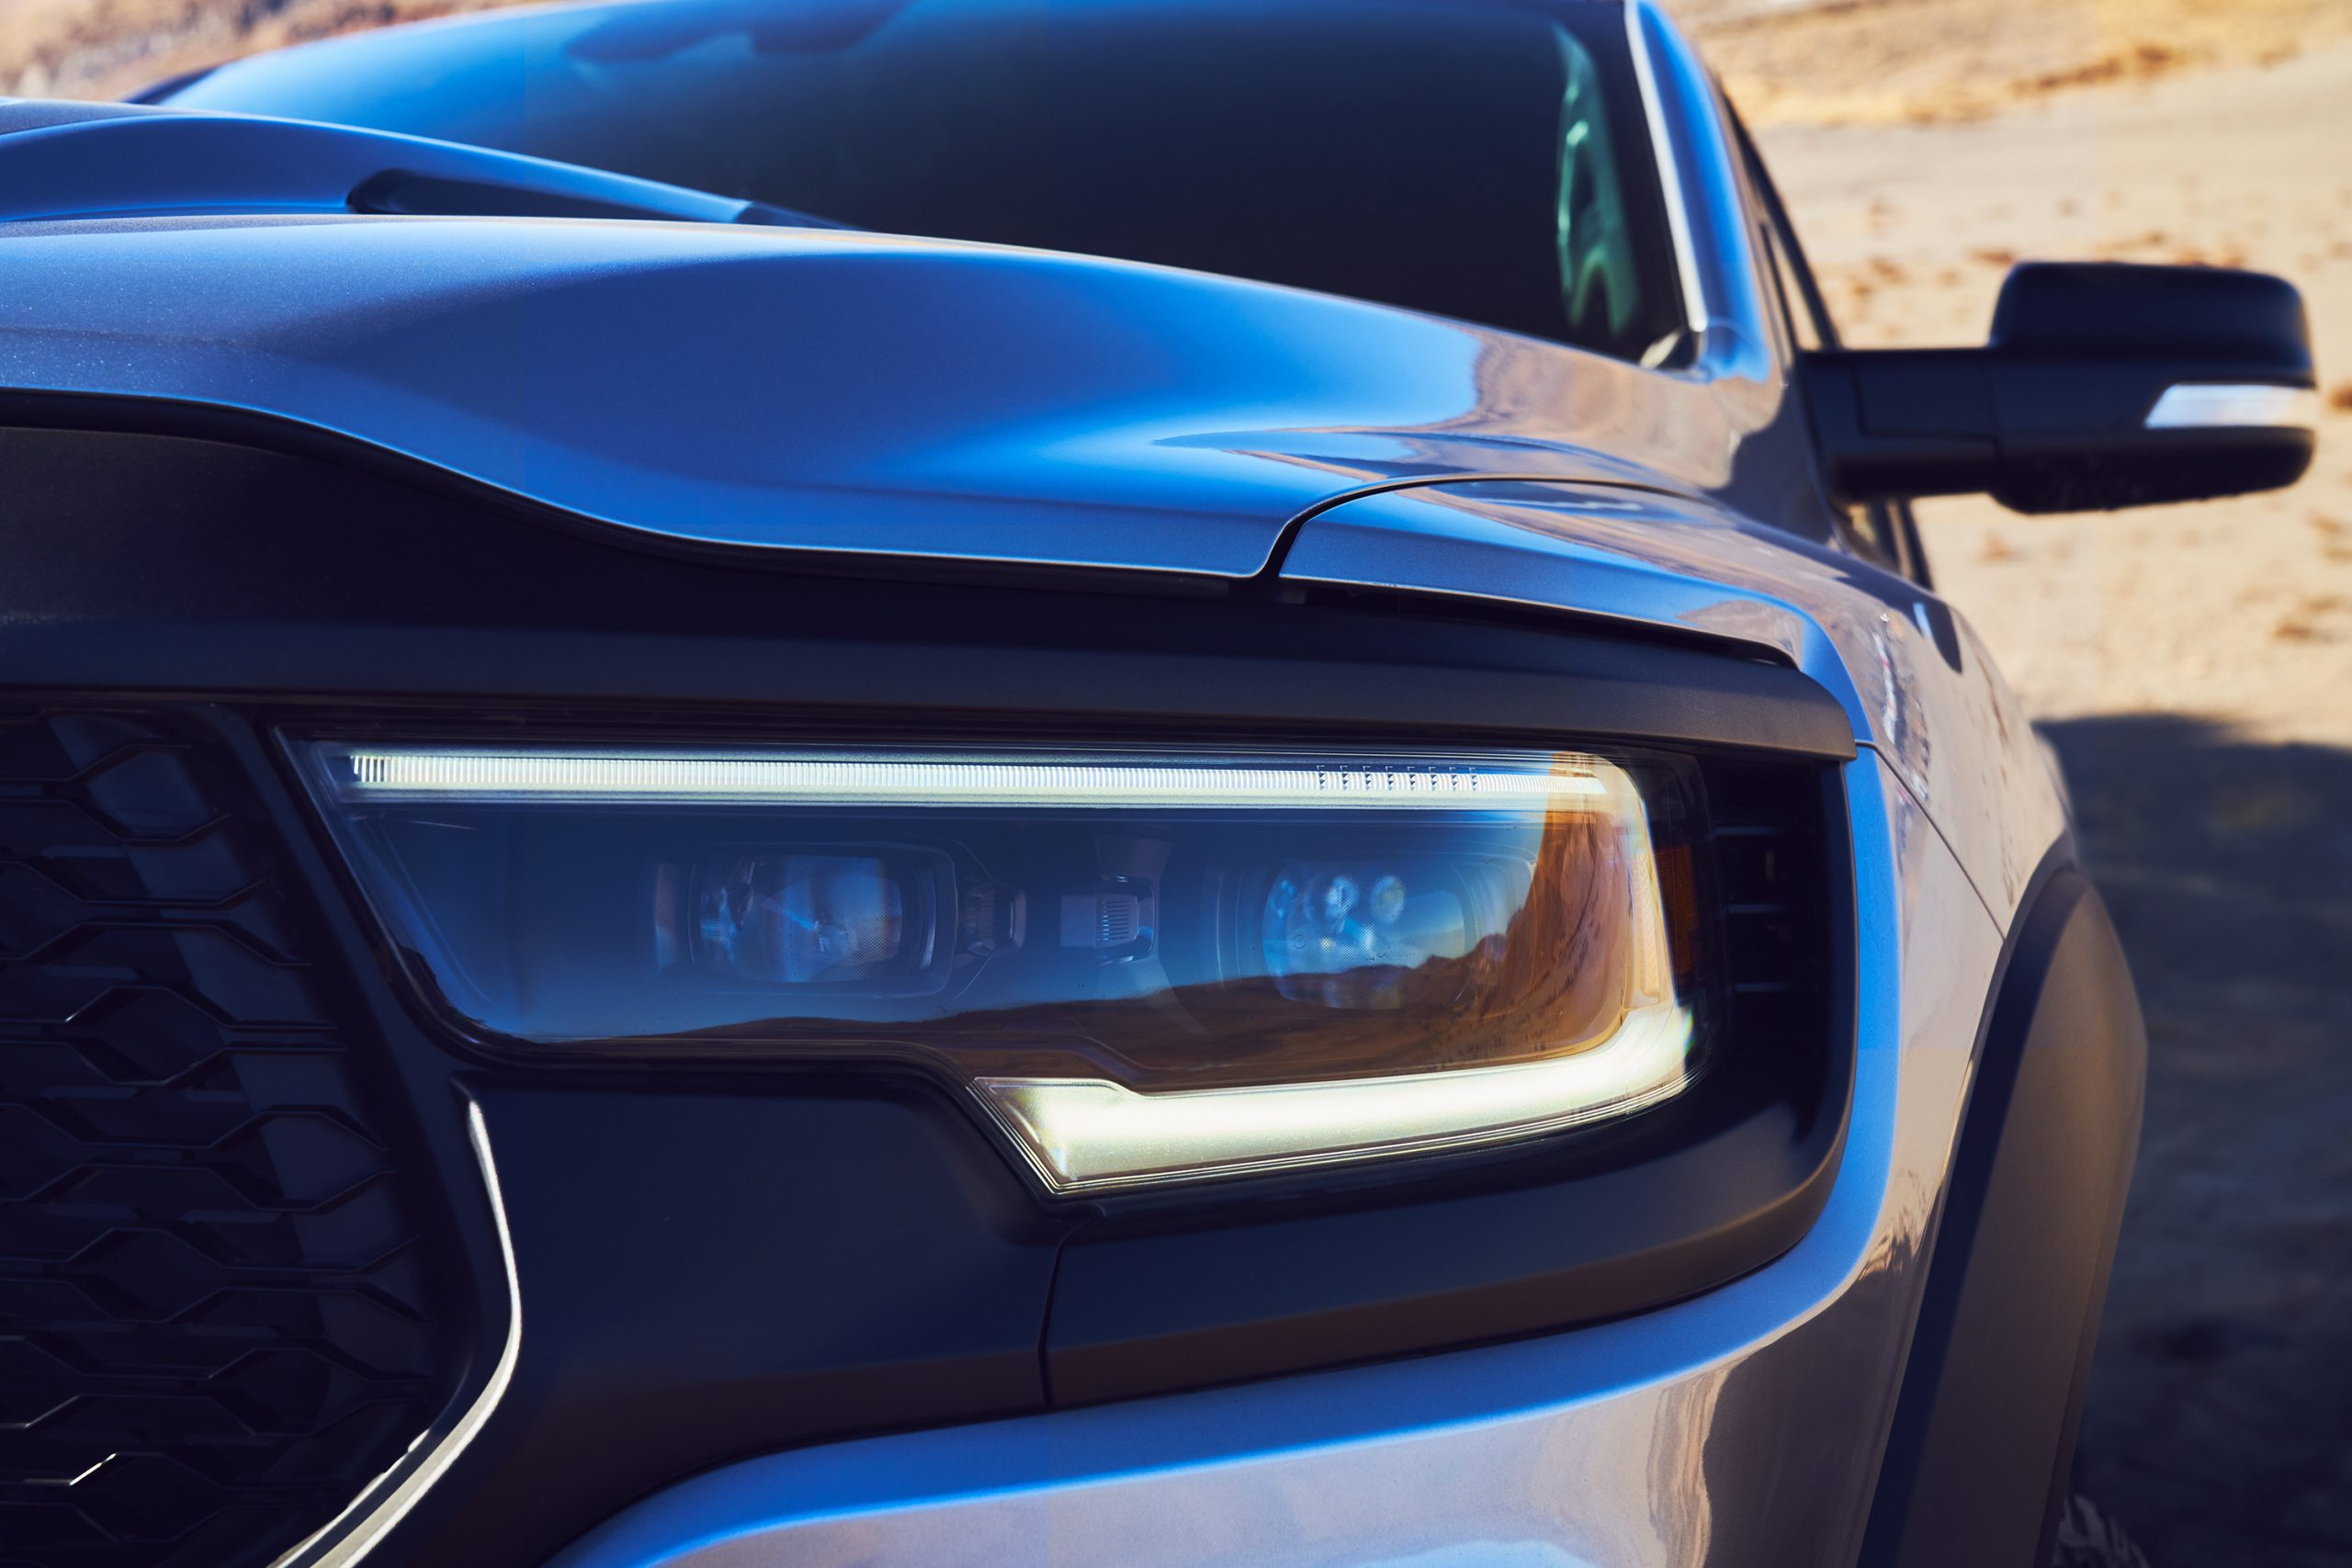 2021 Ram 1500 TRX headlight detail close